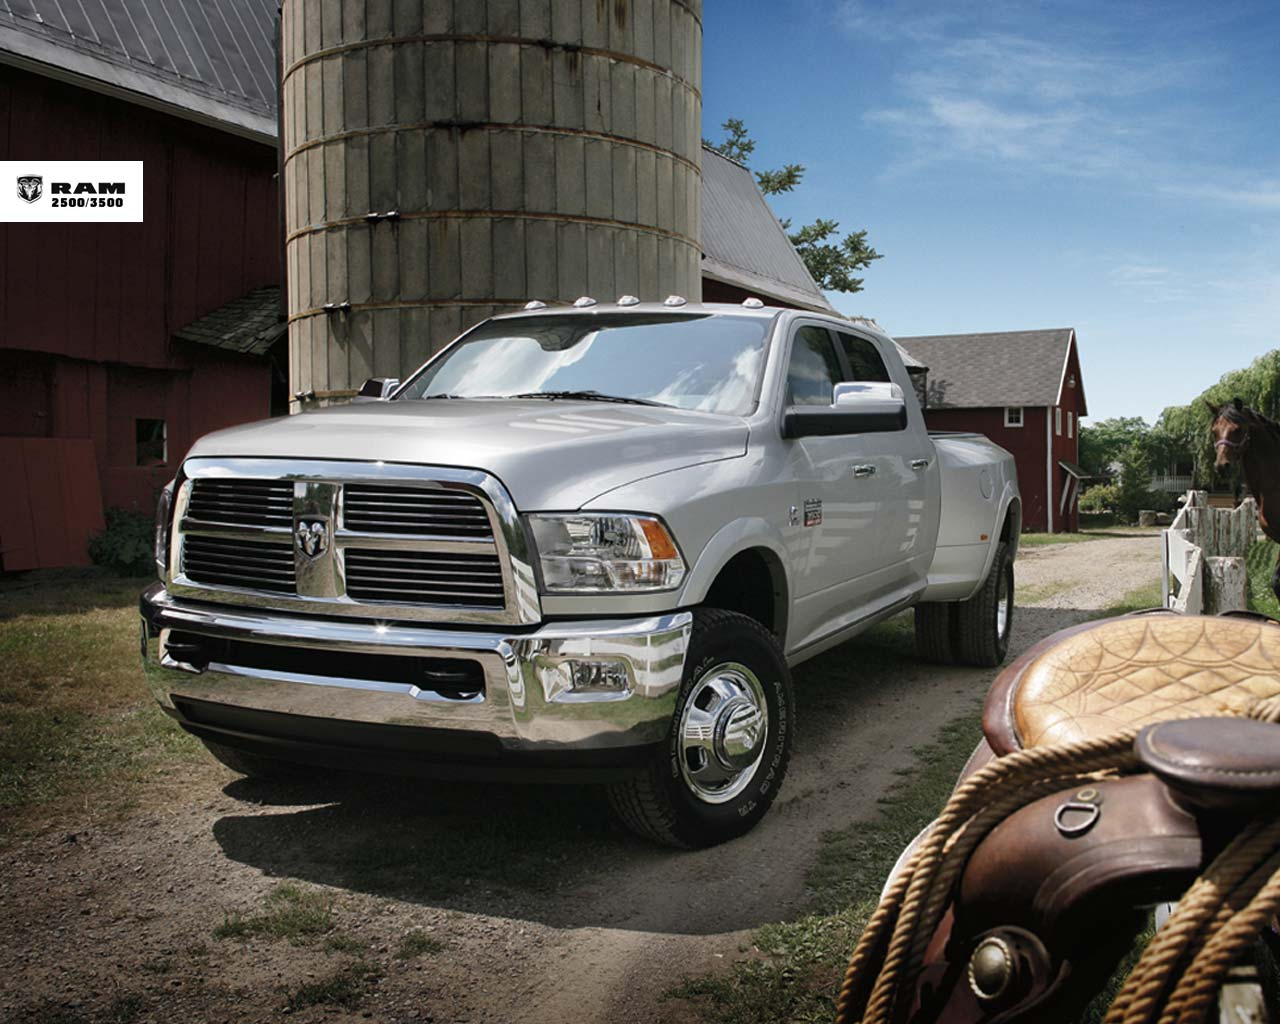 Dodge Ram 3500 Wallpaper 5487 Hd Wallpapers in Cars   Imagescicom 1280x1024